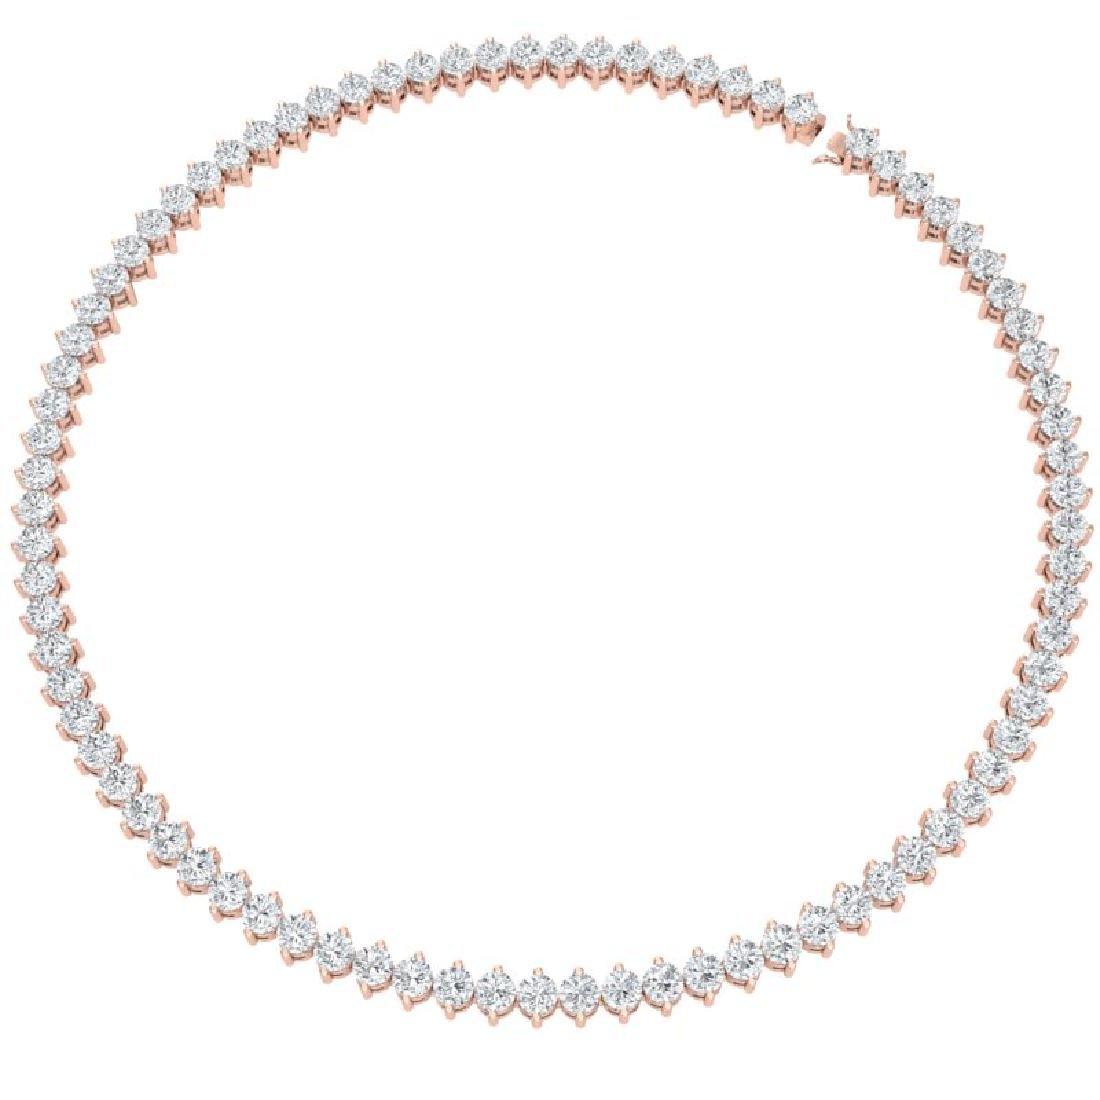 30 CTW Certified VS/SI Diamond Necklace 18K Rose Gold - 3